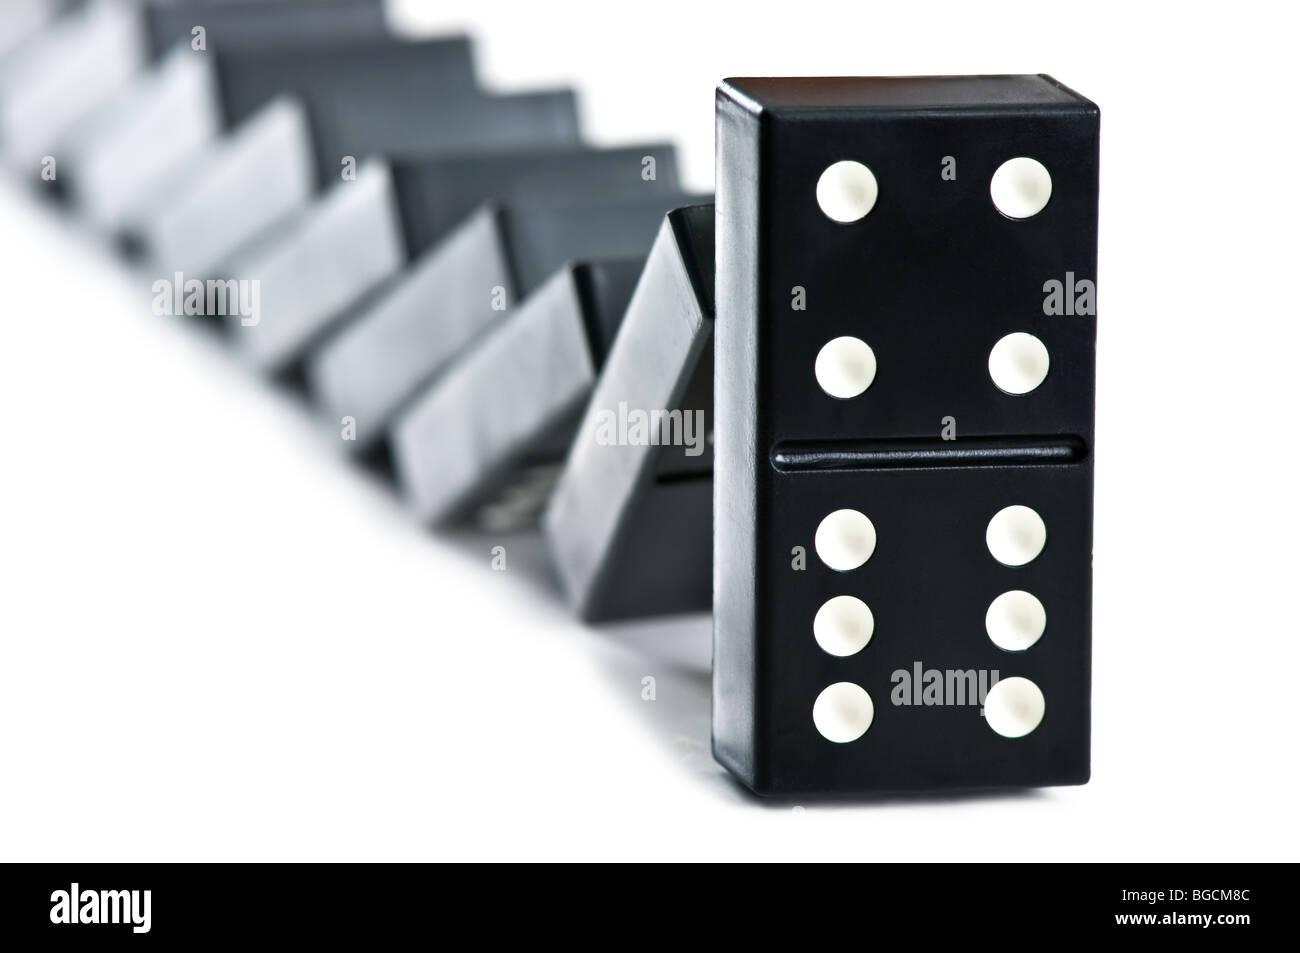 black domino falling - Stock Image